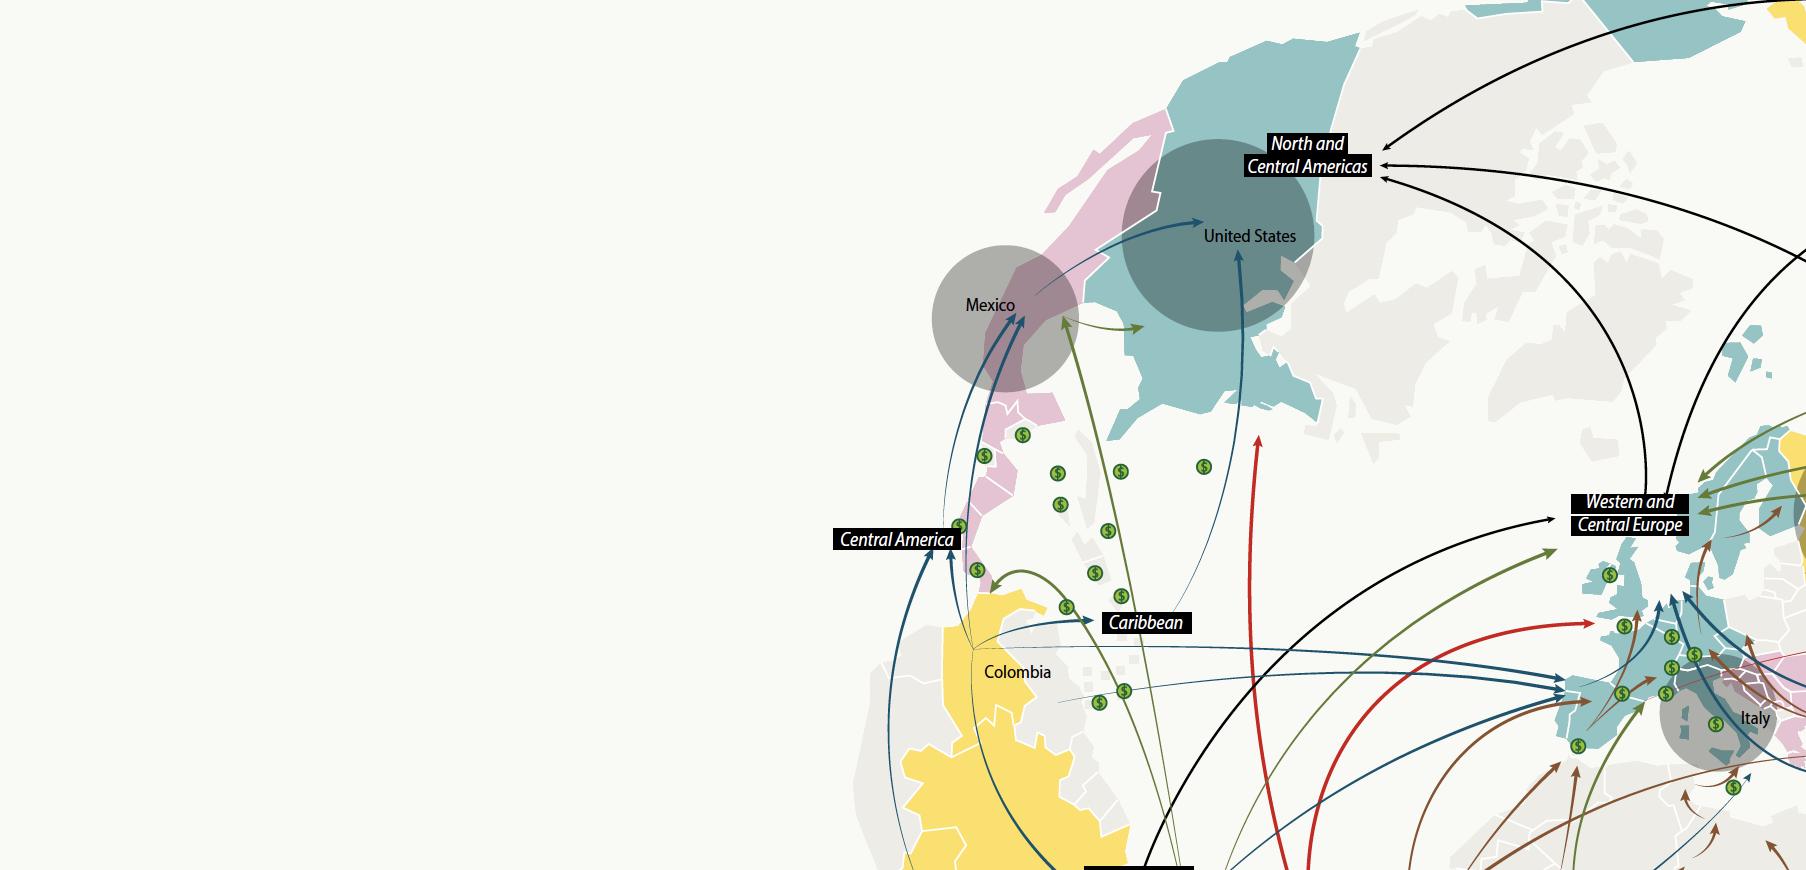 World Atlas of Illicit Flows | Global Initiative